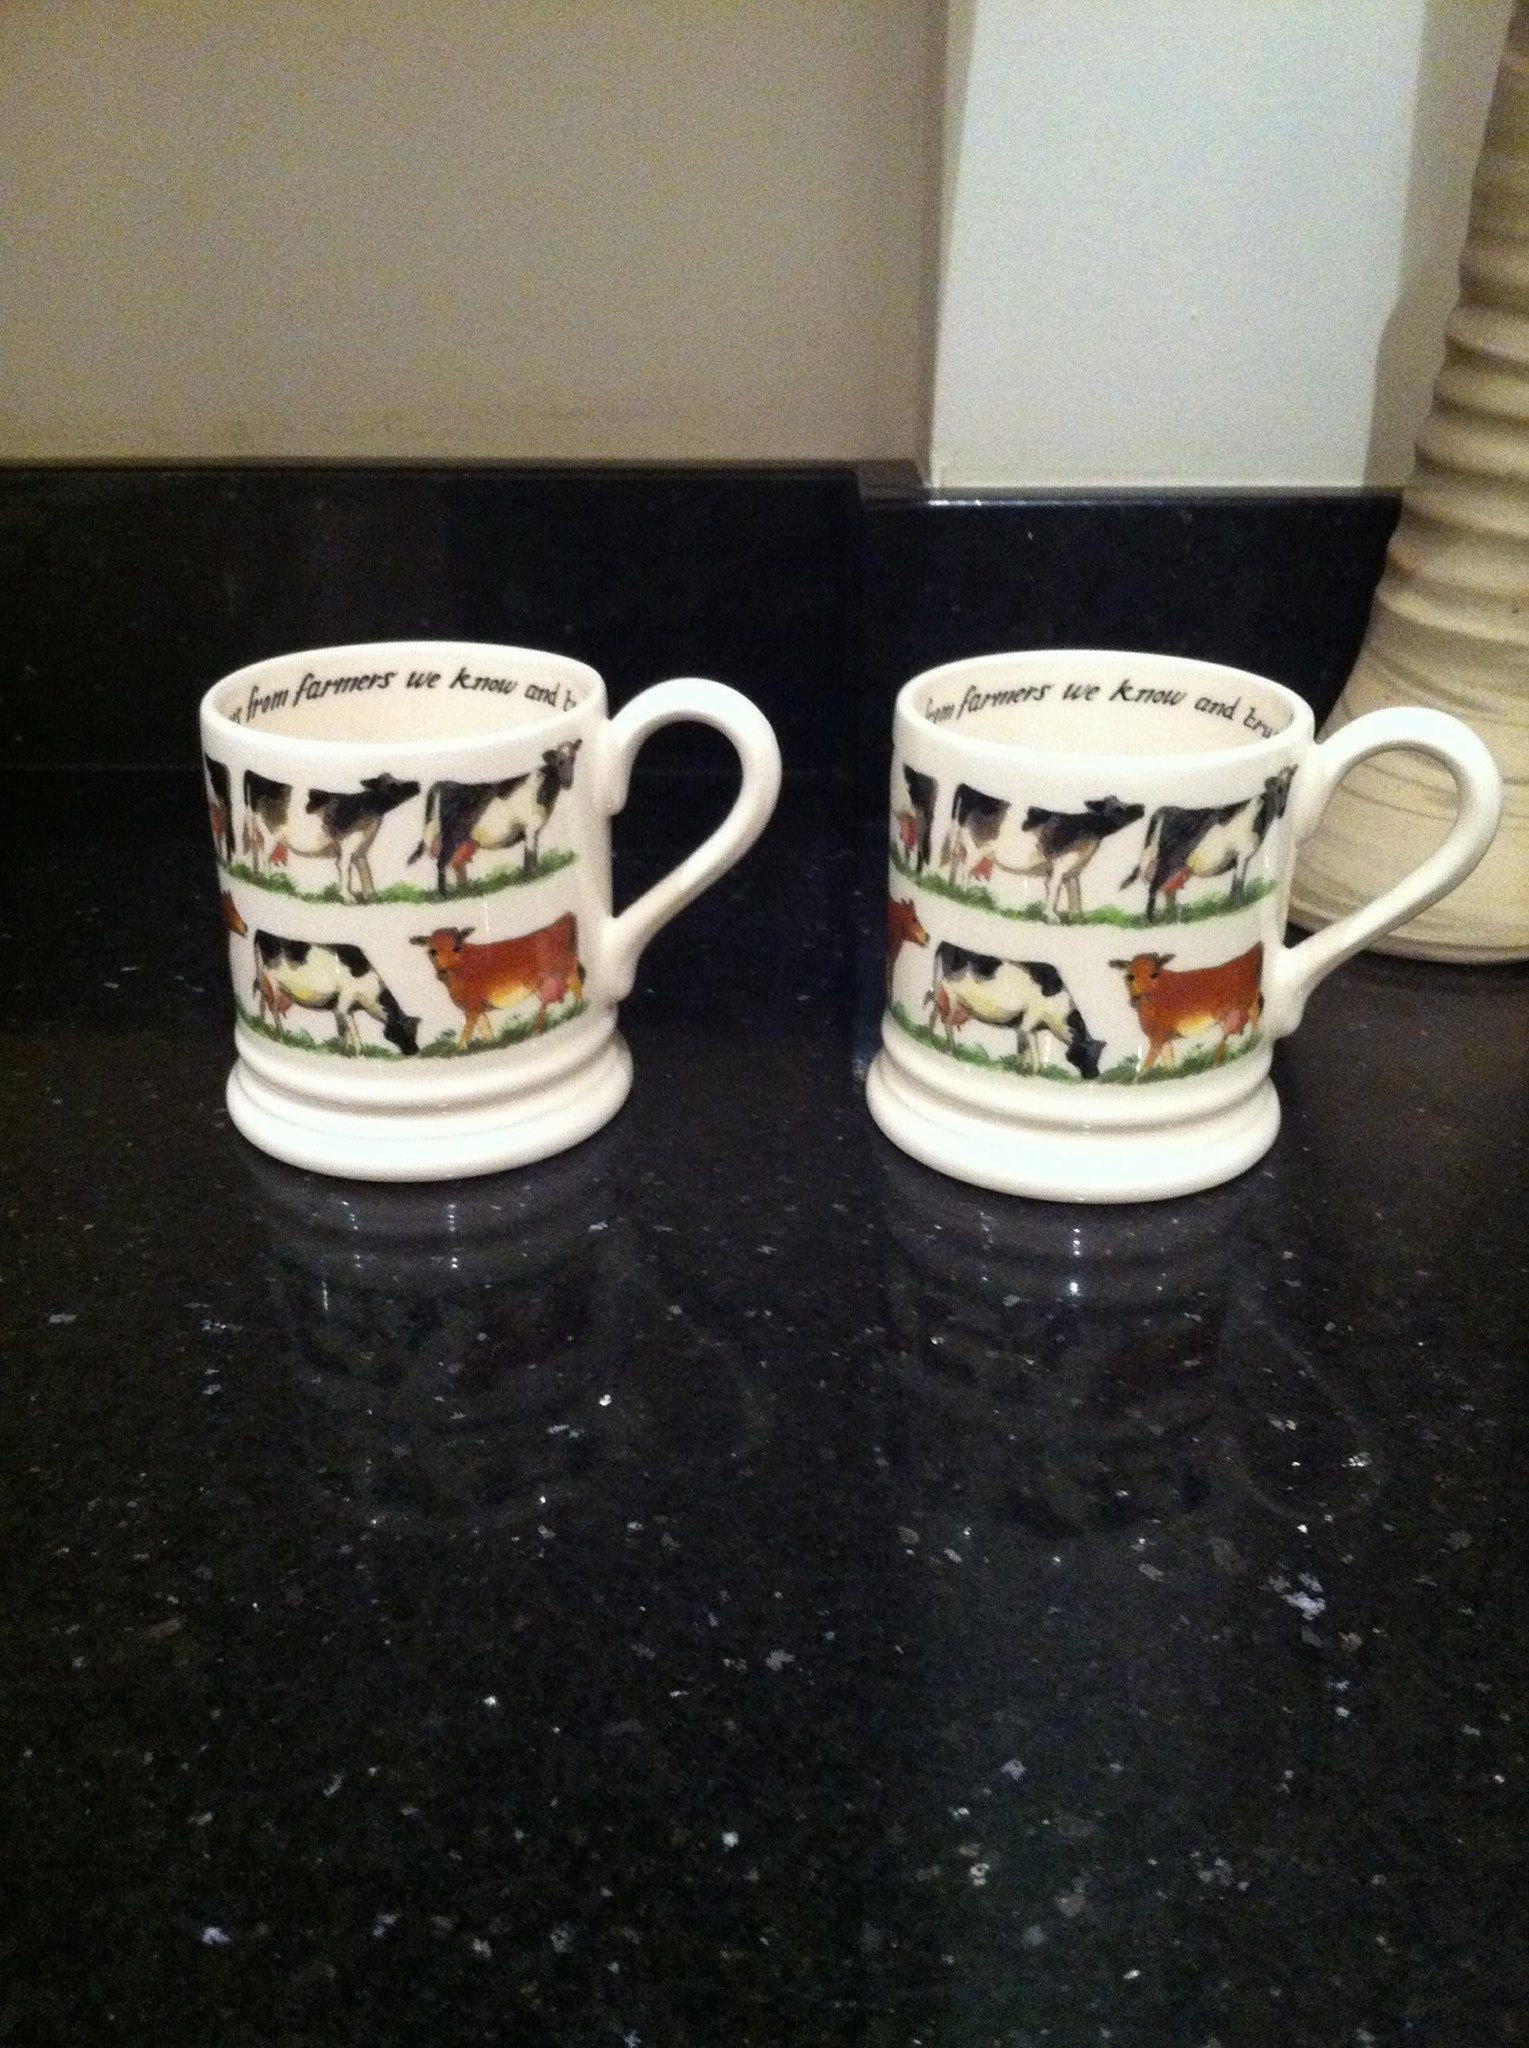 Emma Bridgewater Waitrose Milk 0.5 Pint Mugs